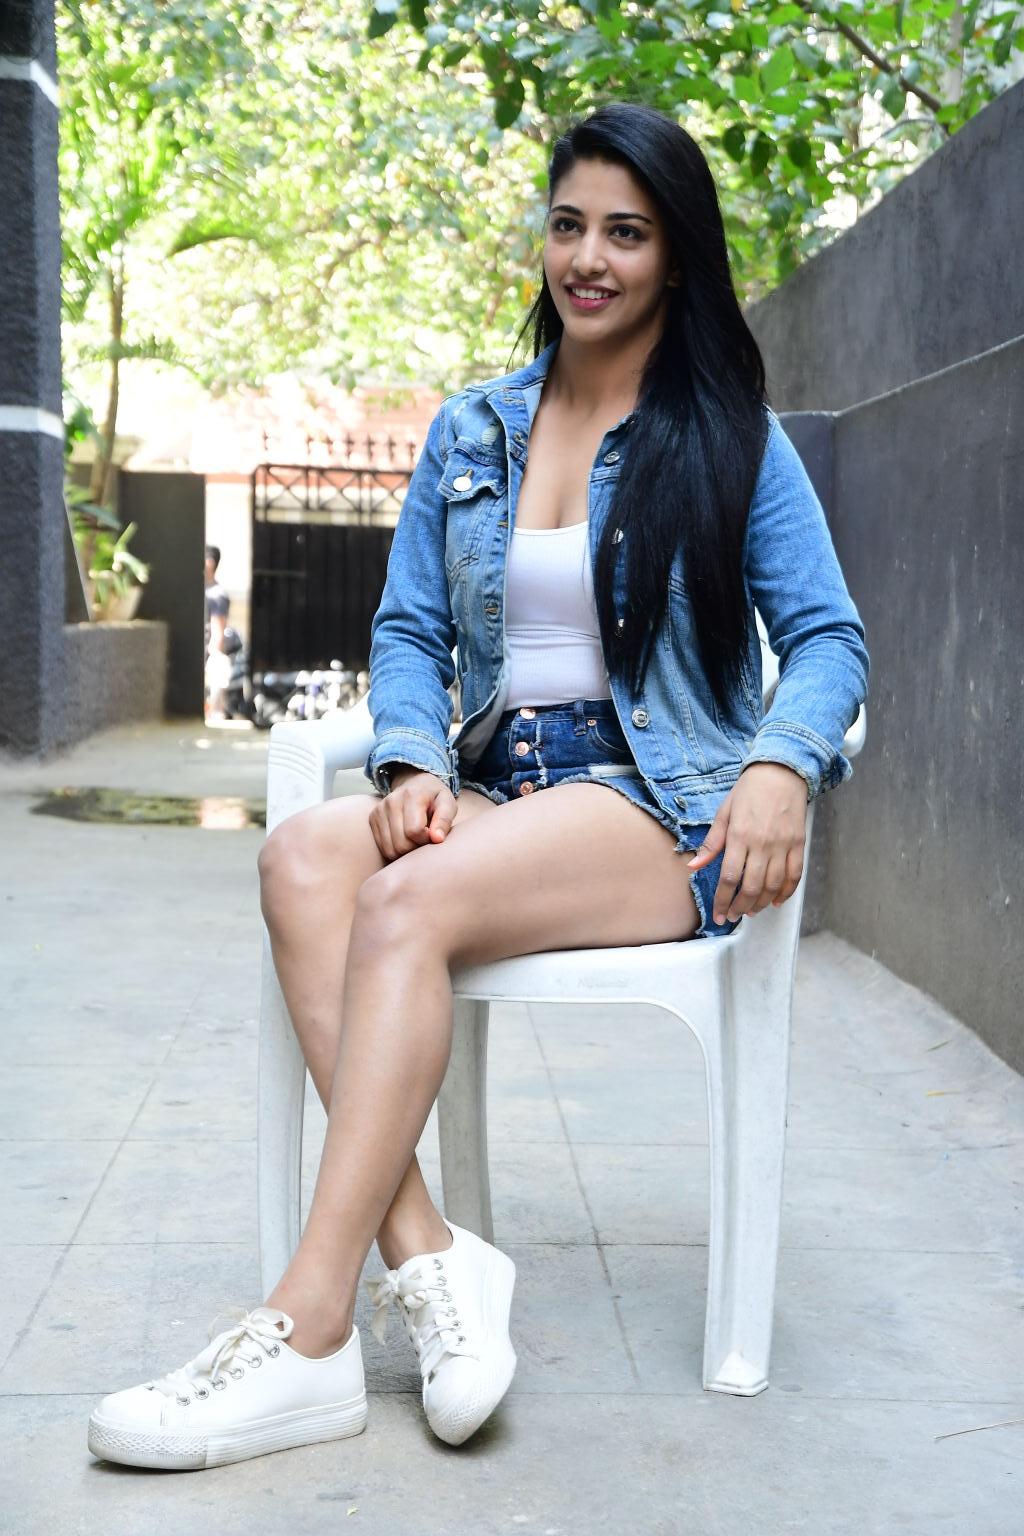 Daksha Nagarkar Photoshoot in Shorts - Latest Movie Updates, Movie  Promotions, Branding Online and Offline Digital Marketing Services